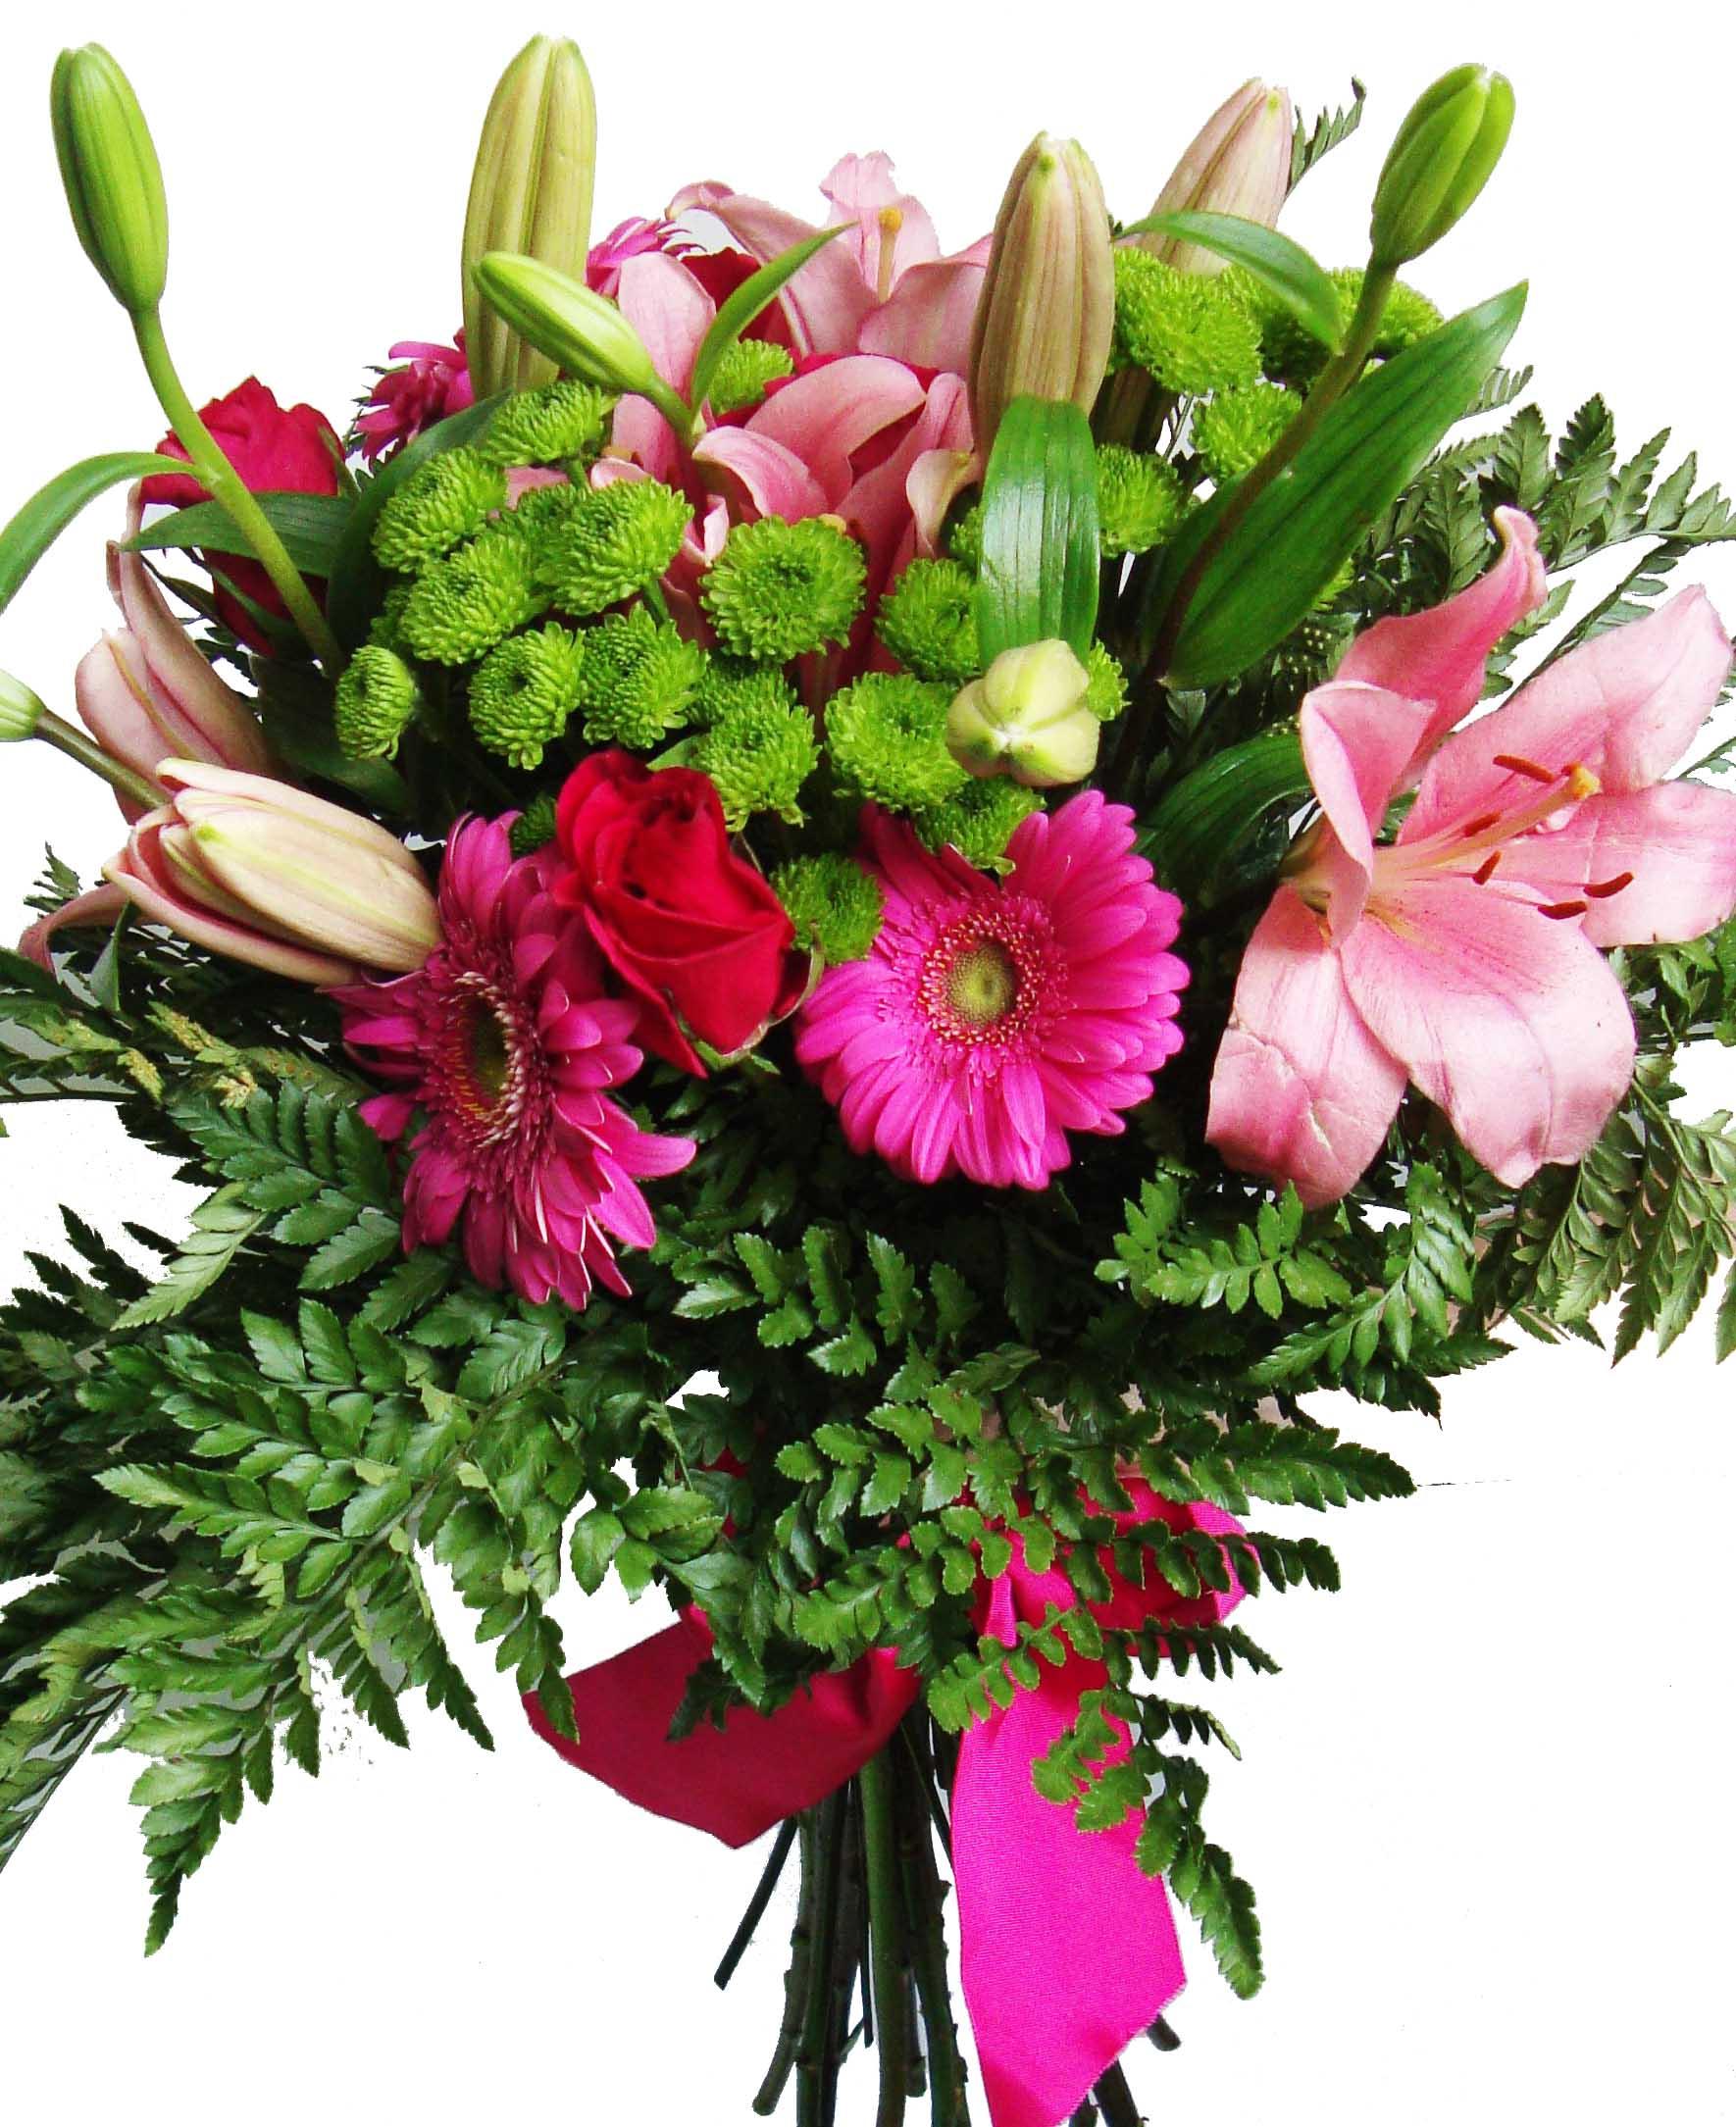 Ramo de rosas regalar enviar ramo de rosas ramos de - Ramos para regalar ...